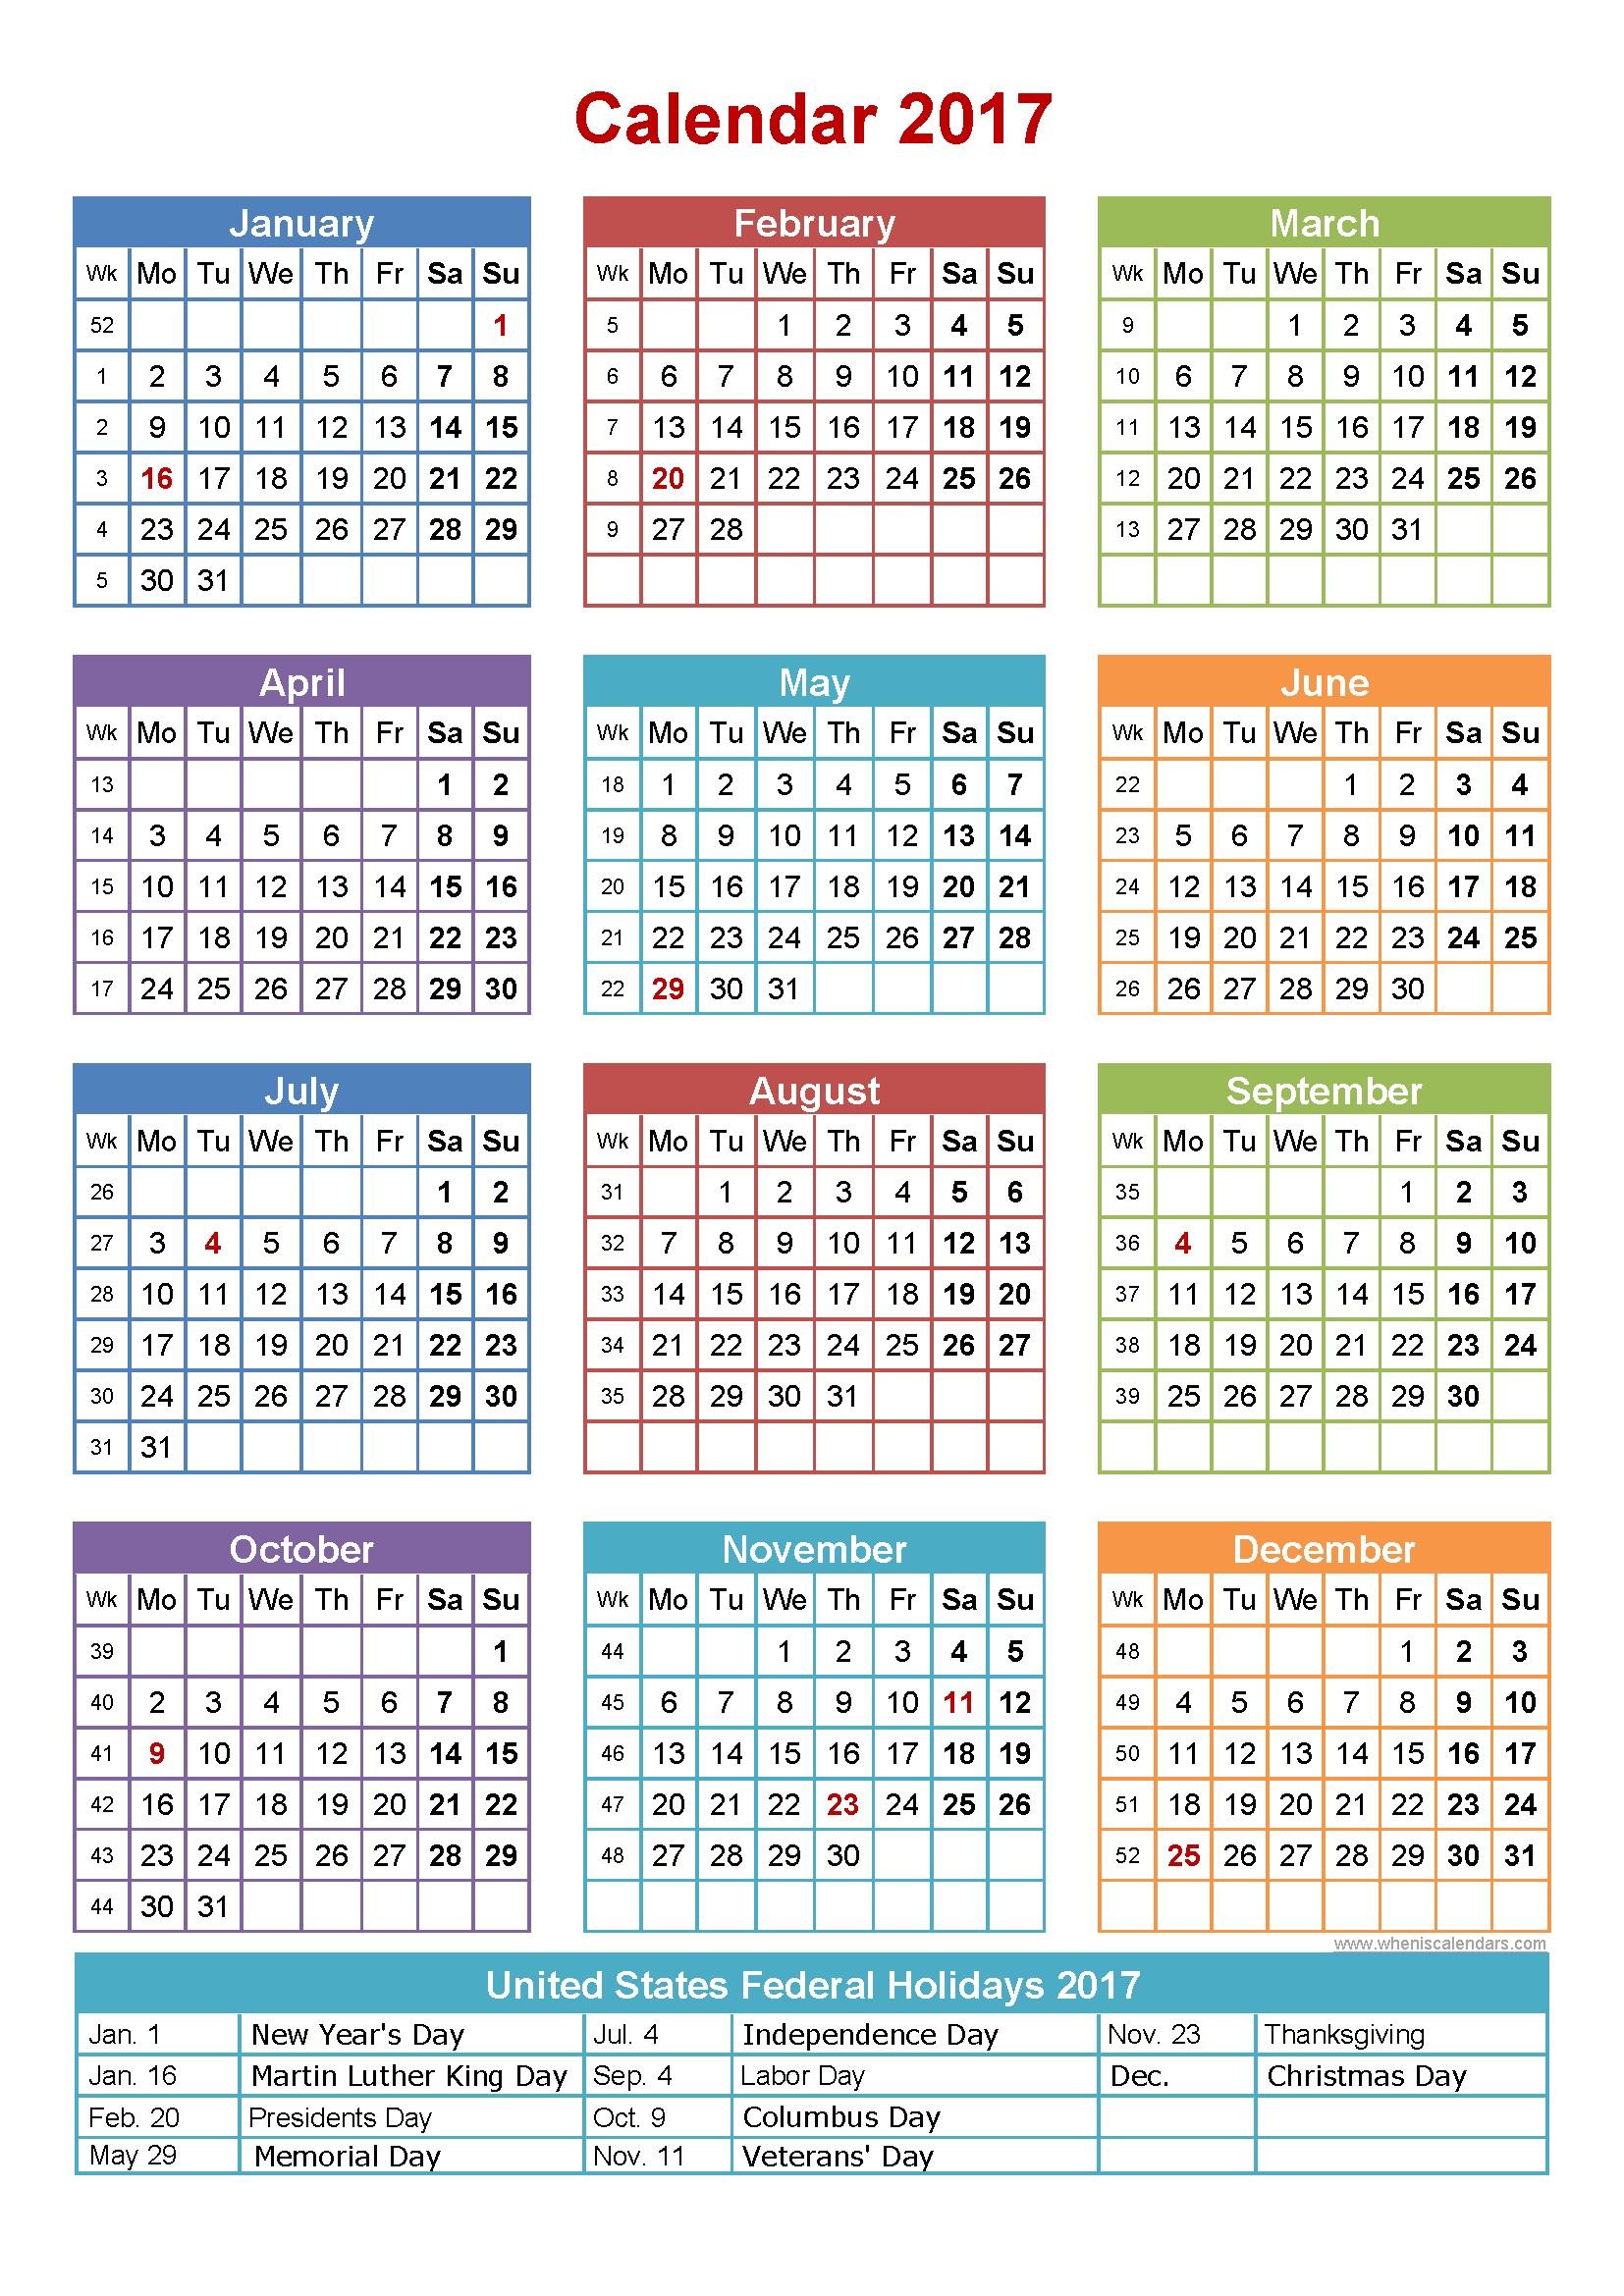 Full Size Printable Calendar Full Size Printable Calendar 2017